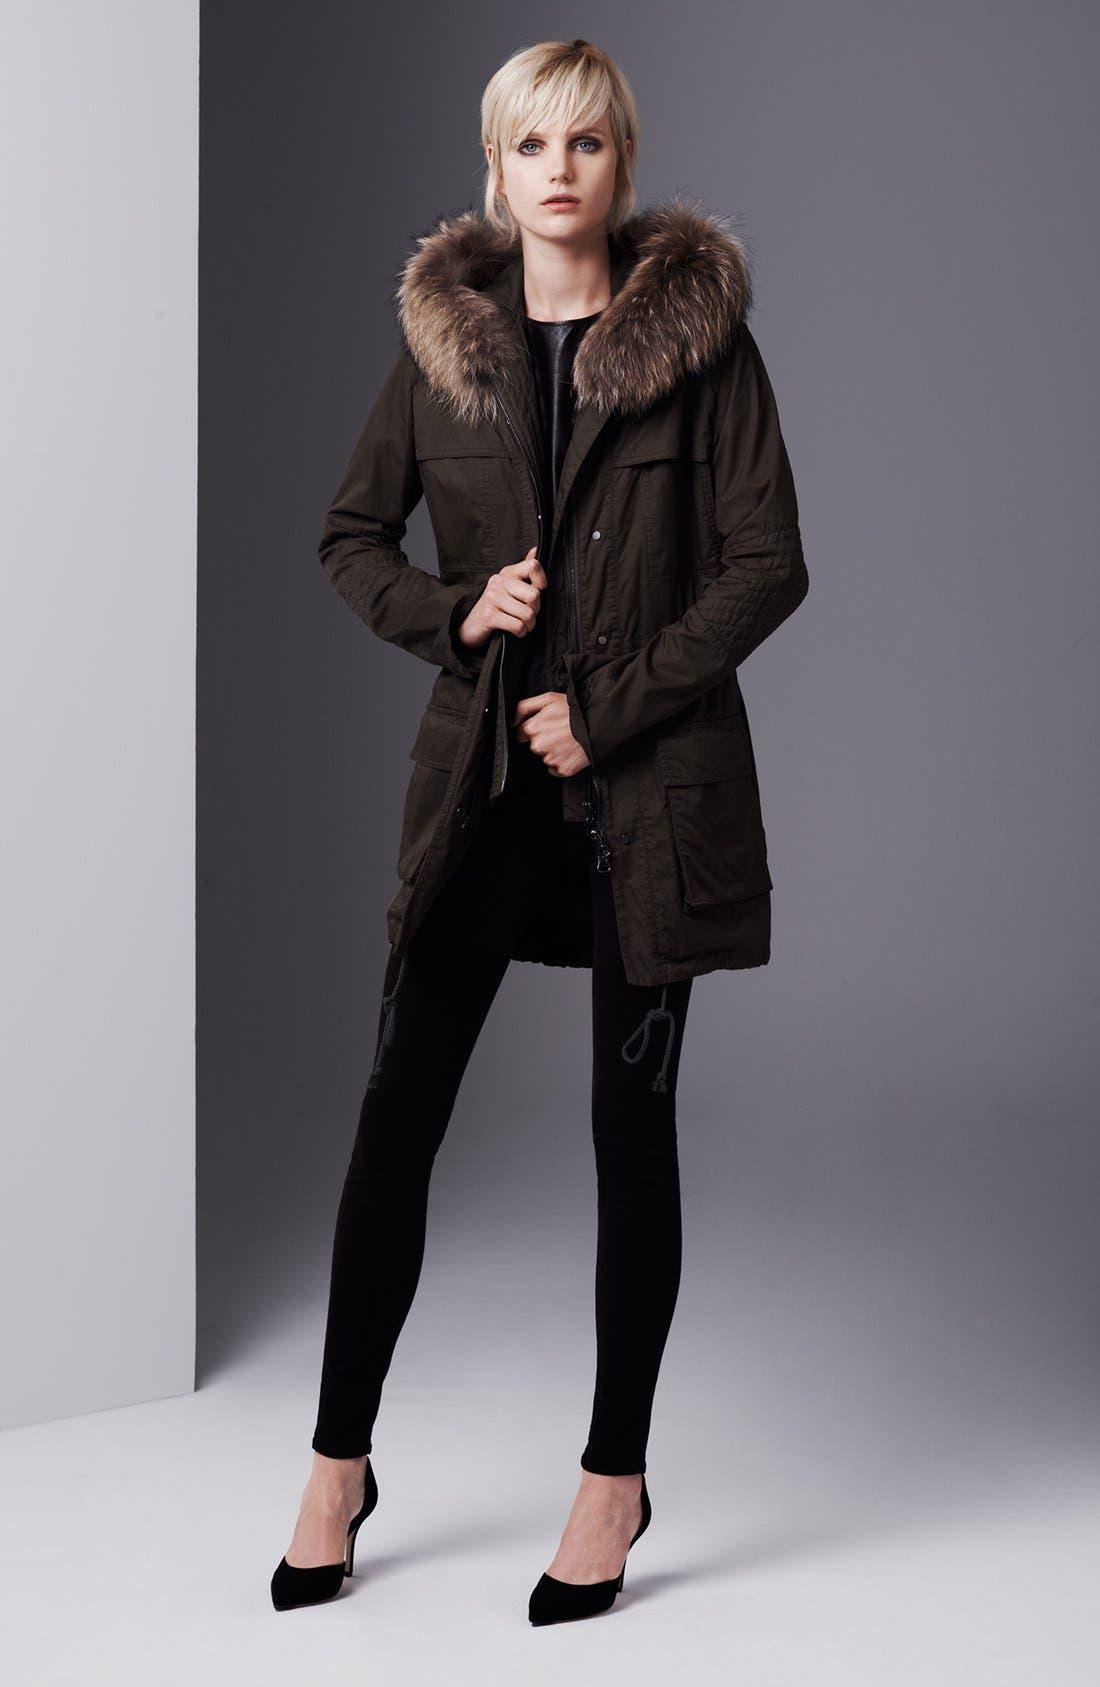 Alternate Image 1 Selected - Vince Genuine Coyote Fur Trim Anorak, Leather Tee & Jeans